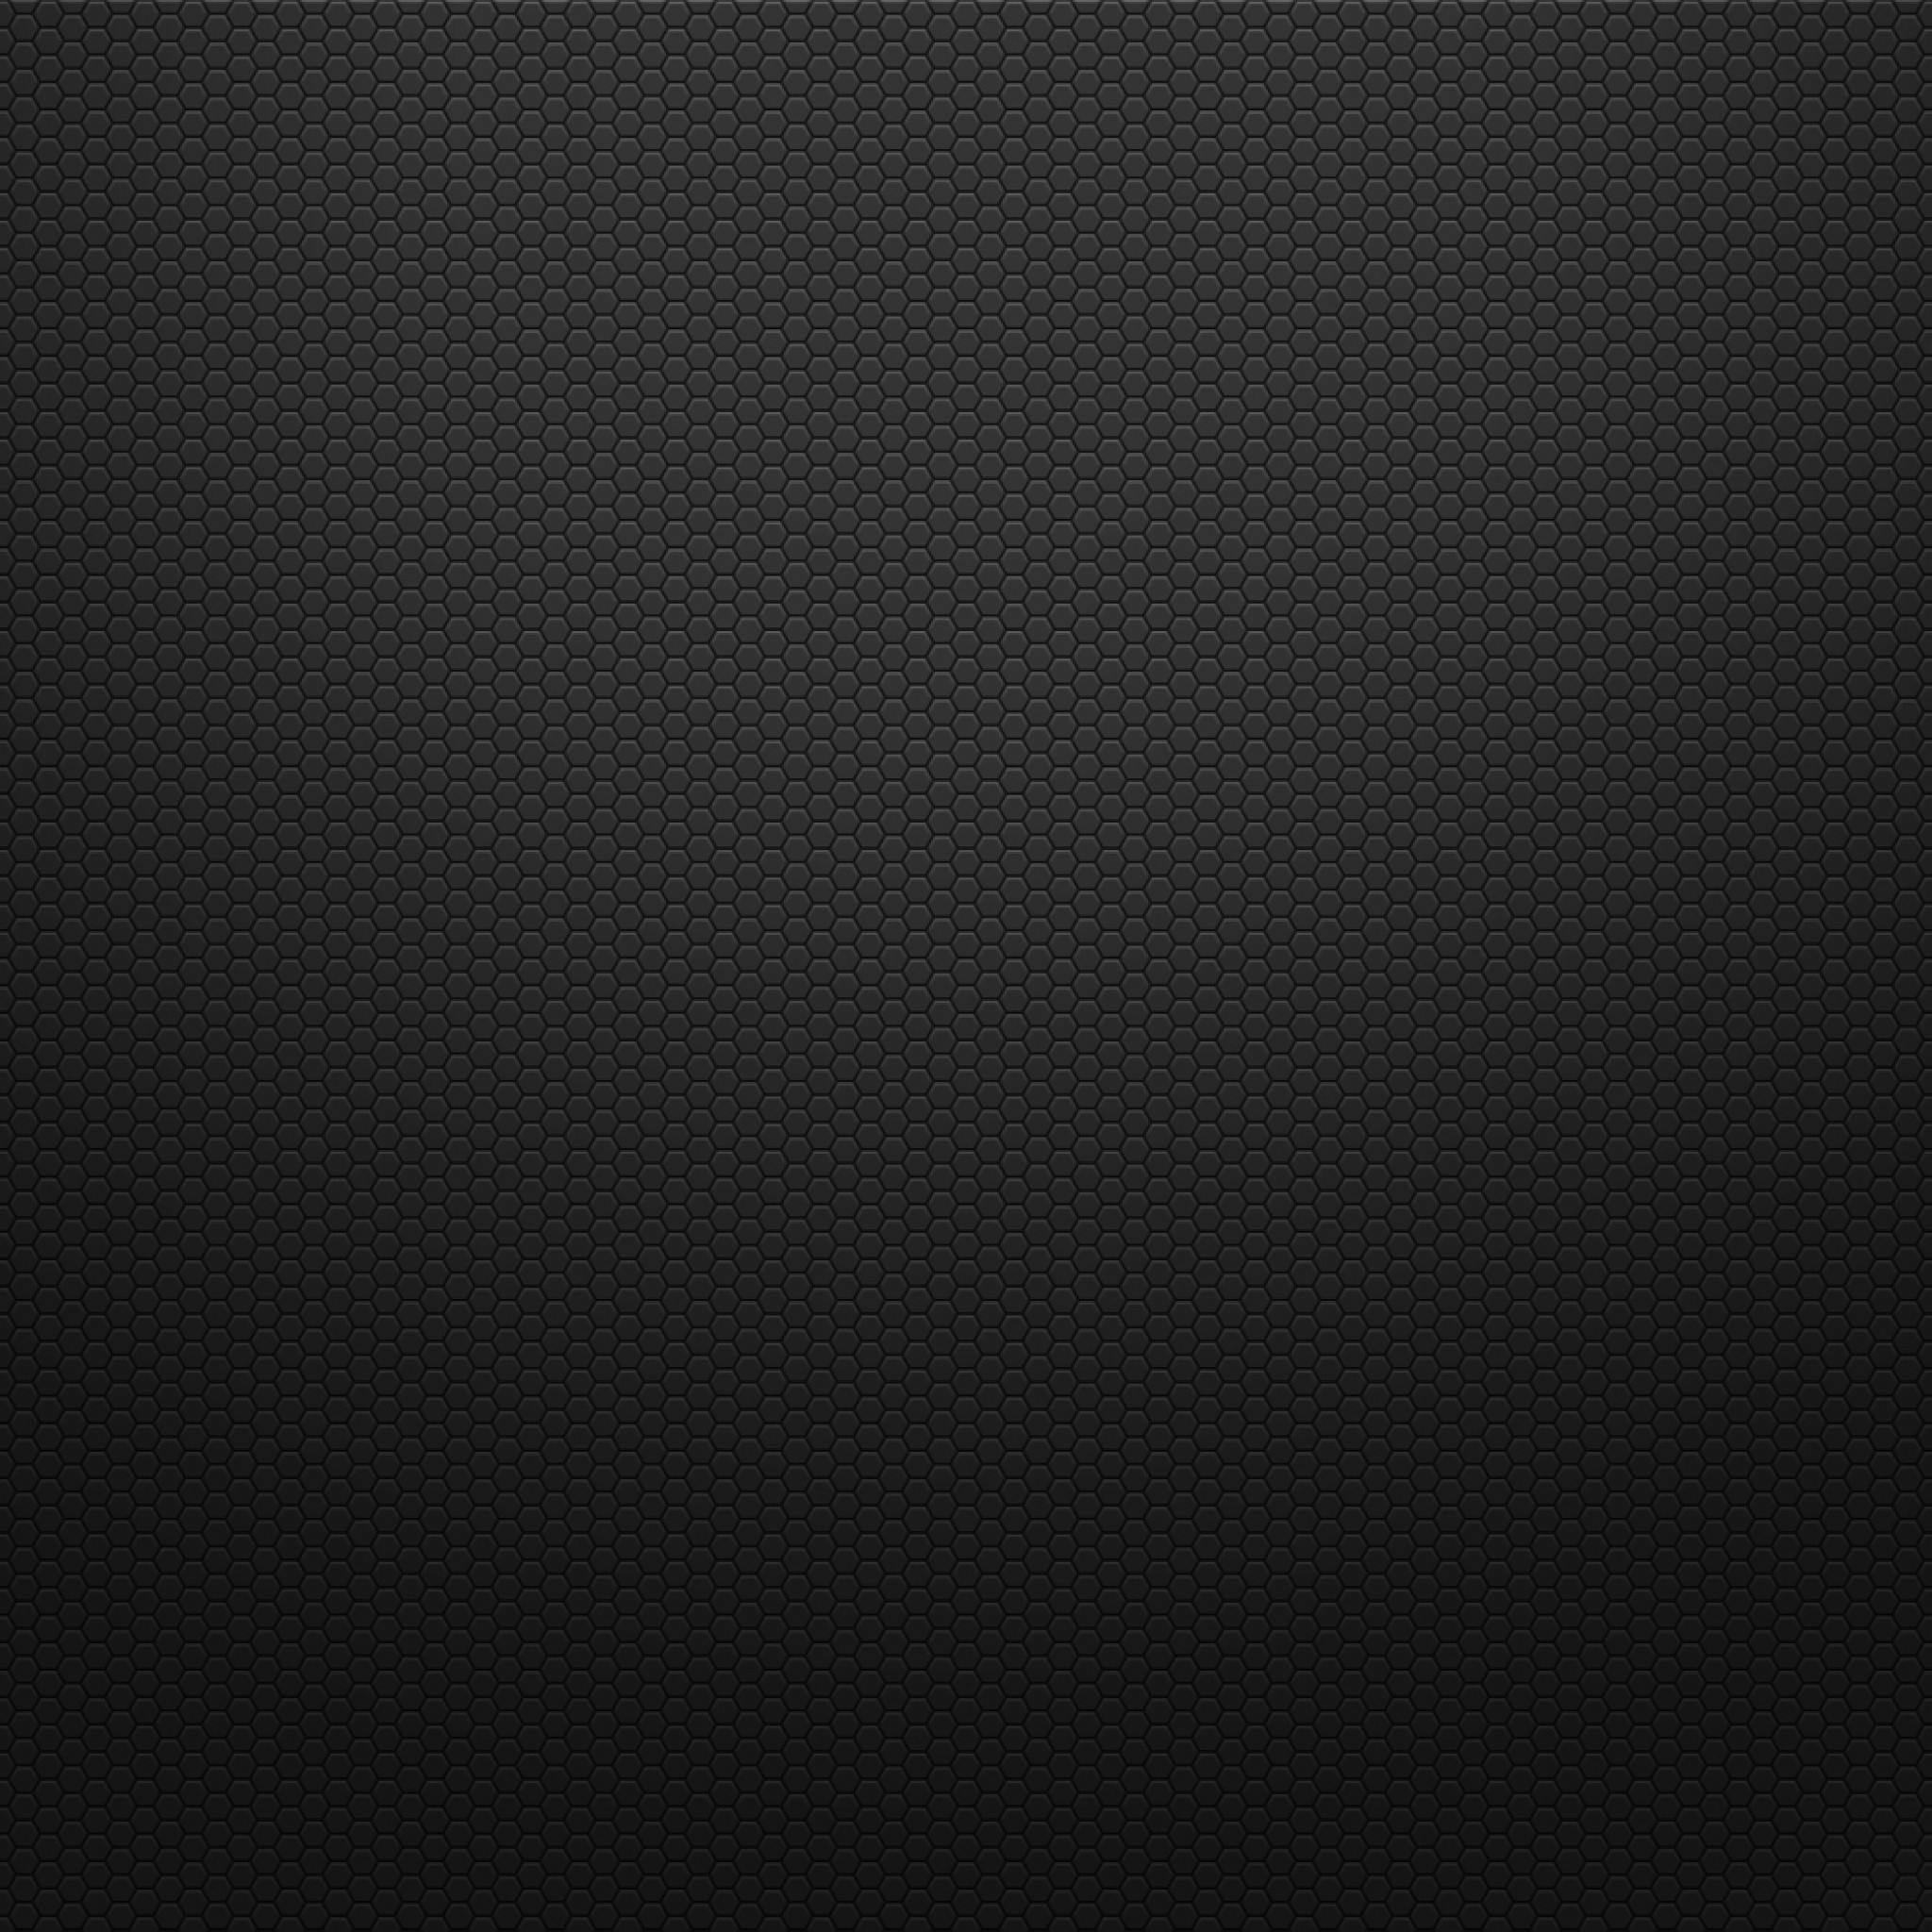 Wallpapers general iPad 34 Air Wallpaper iPad Wallpaper Gallery 2048x2048